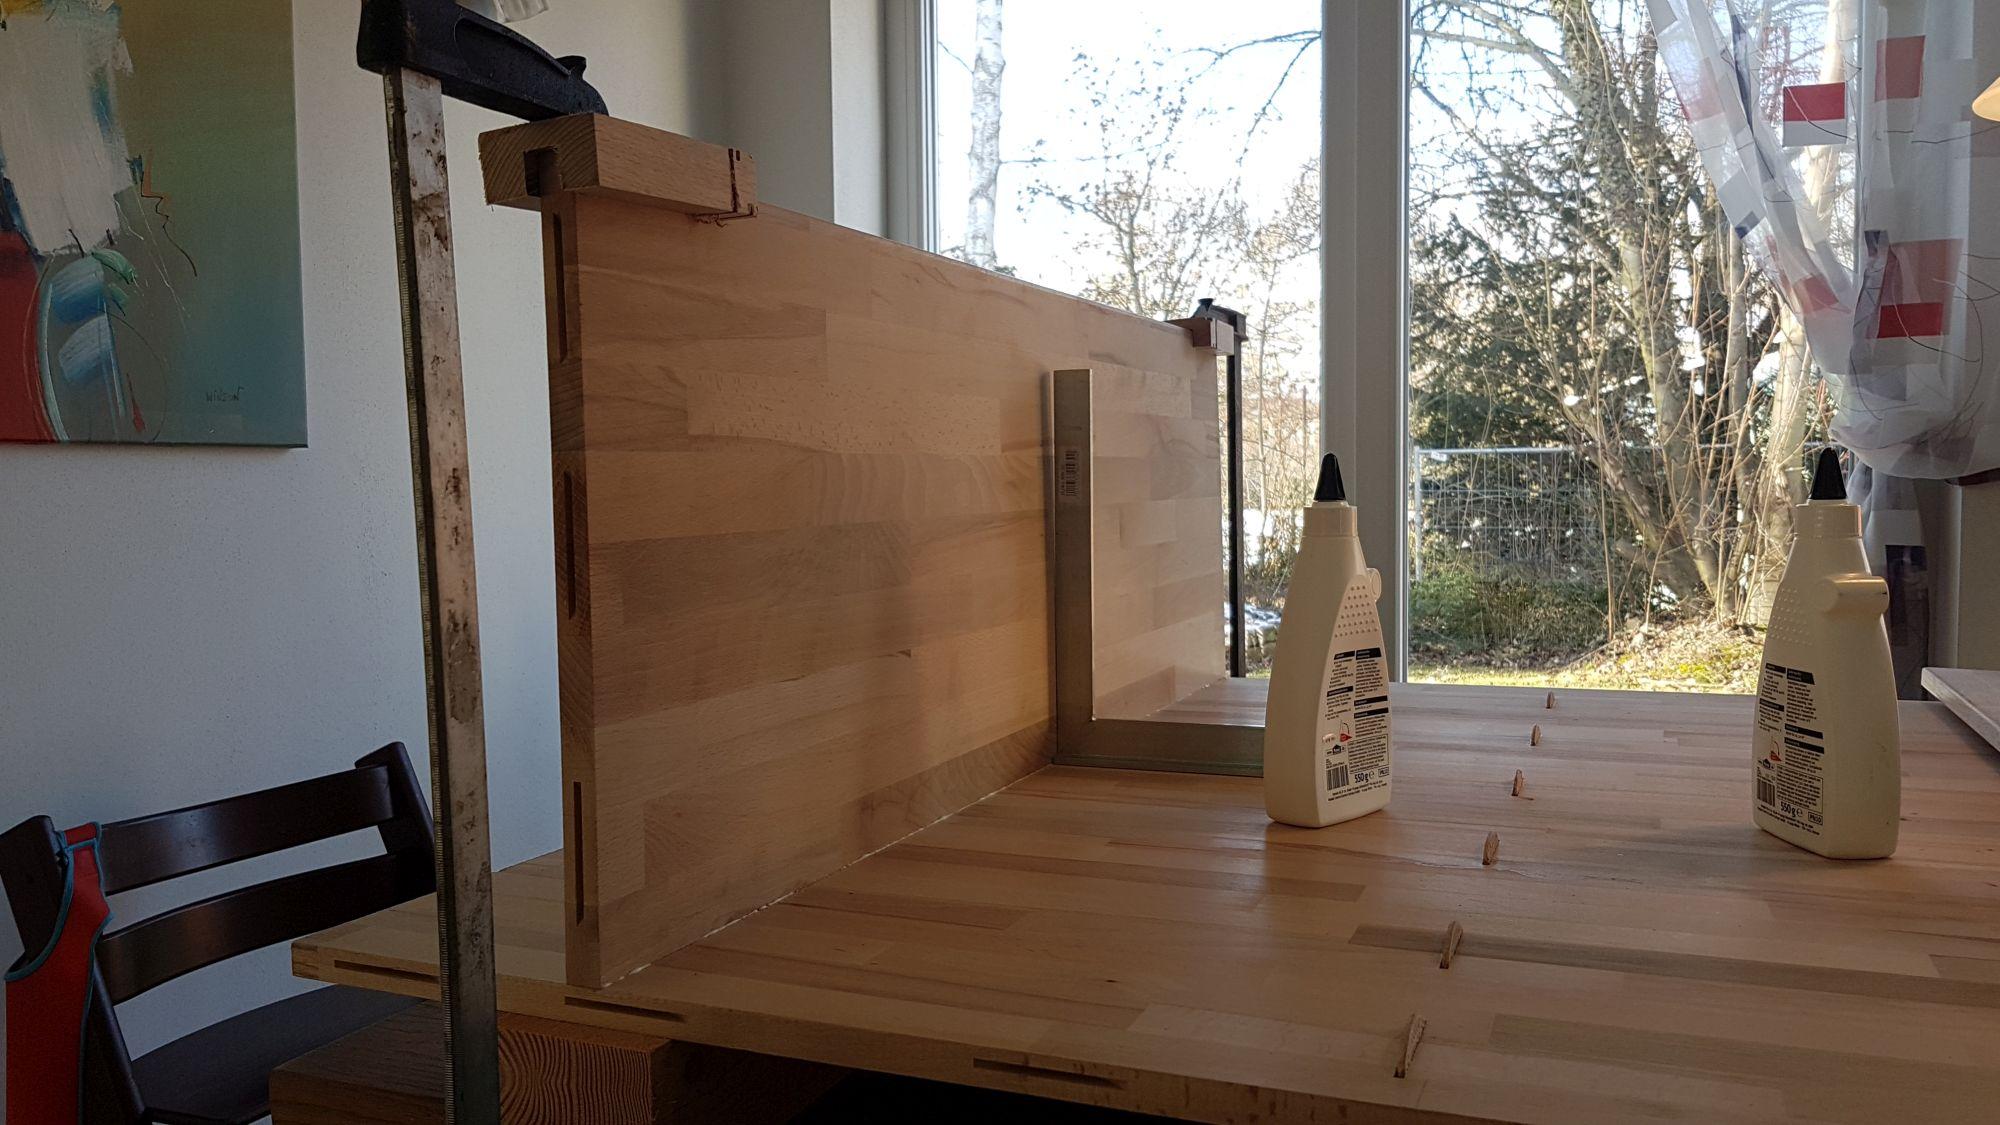 Büroschrank selber bauen, Böden verleimen